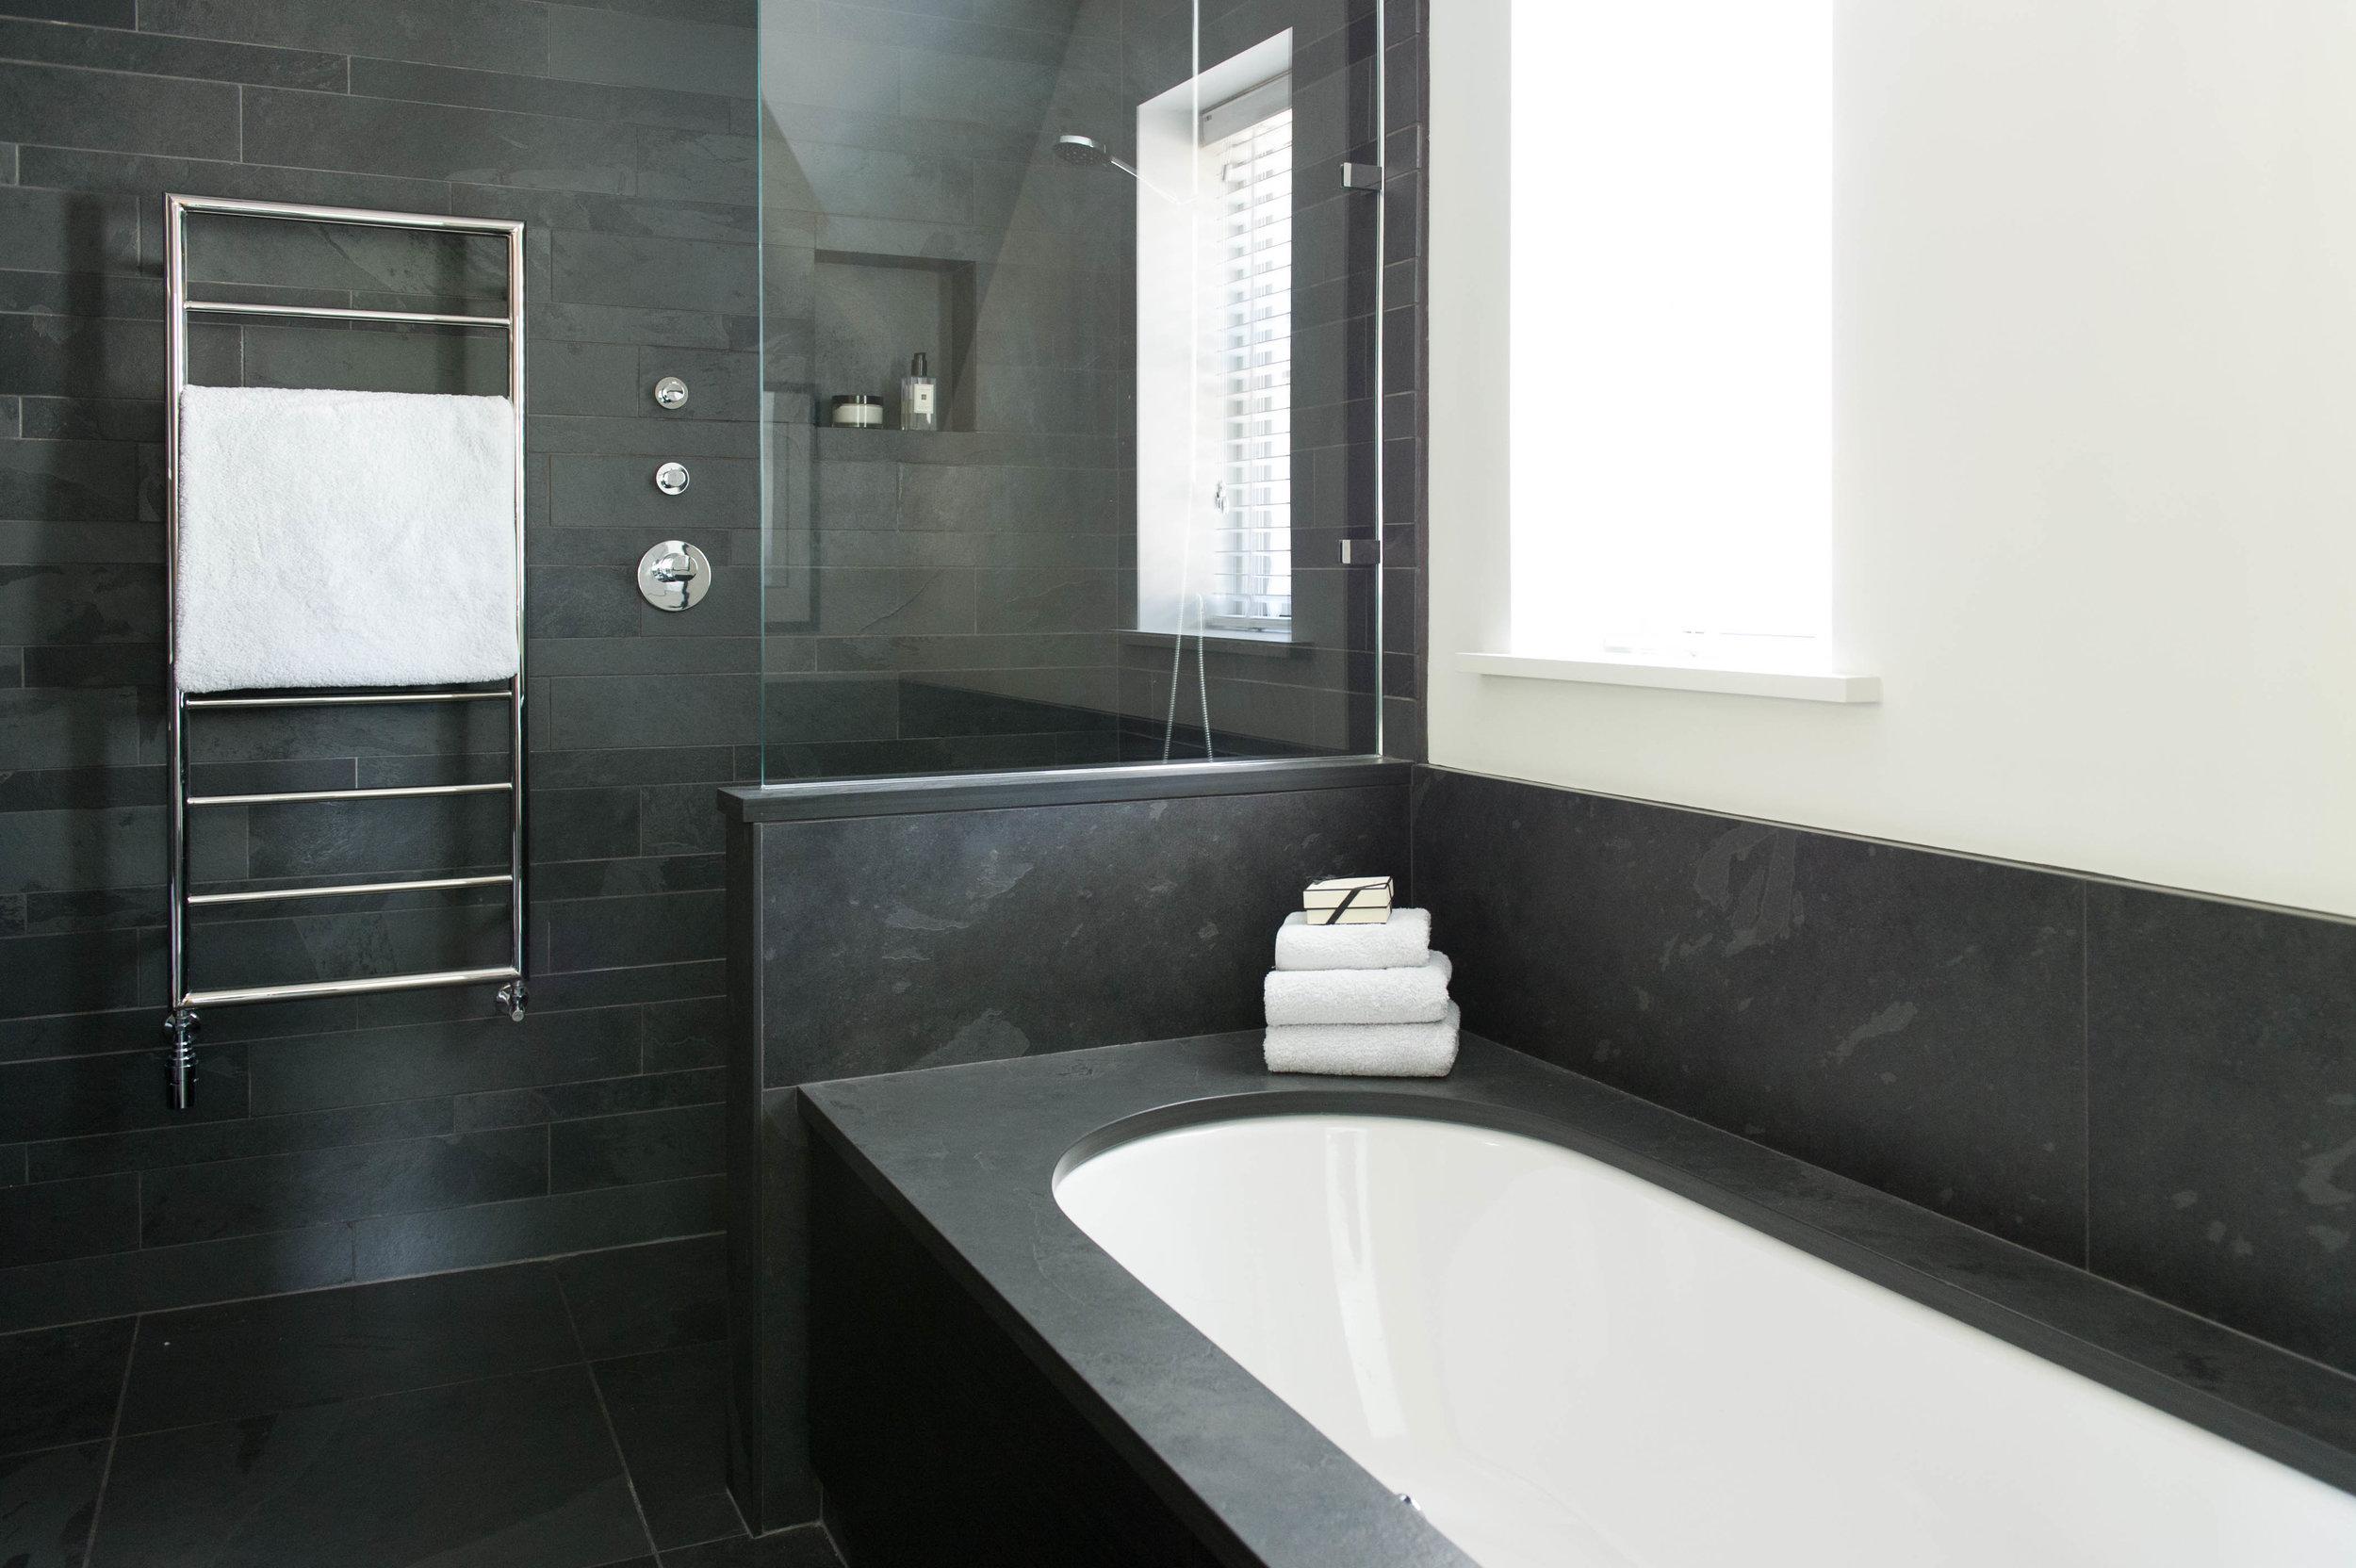 Bathroom design with black slate tiles, inset bath and walk-in shower.